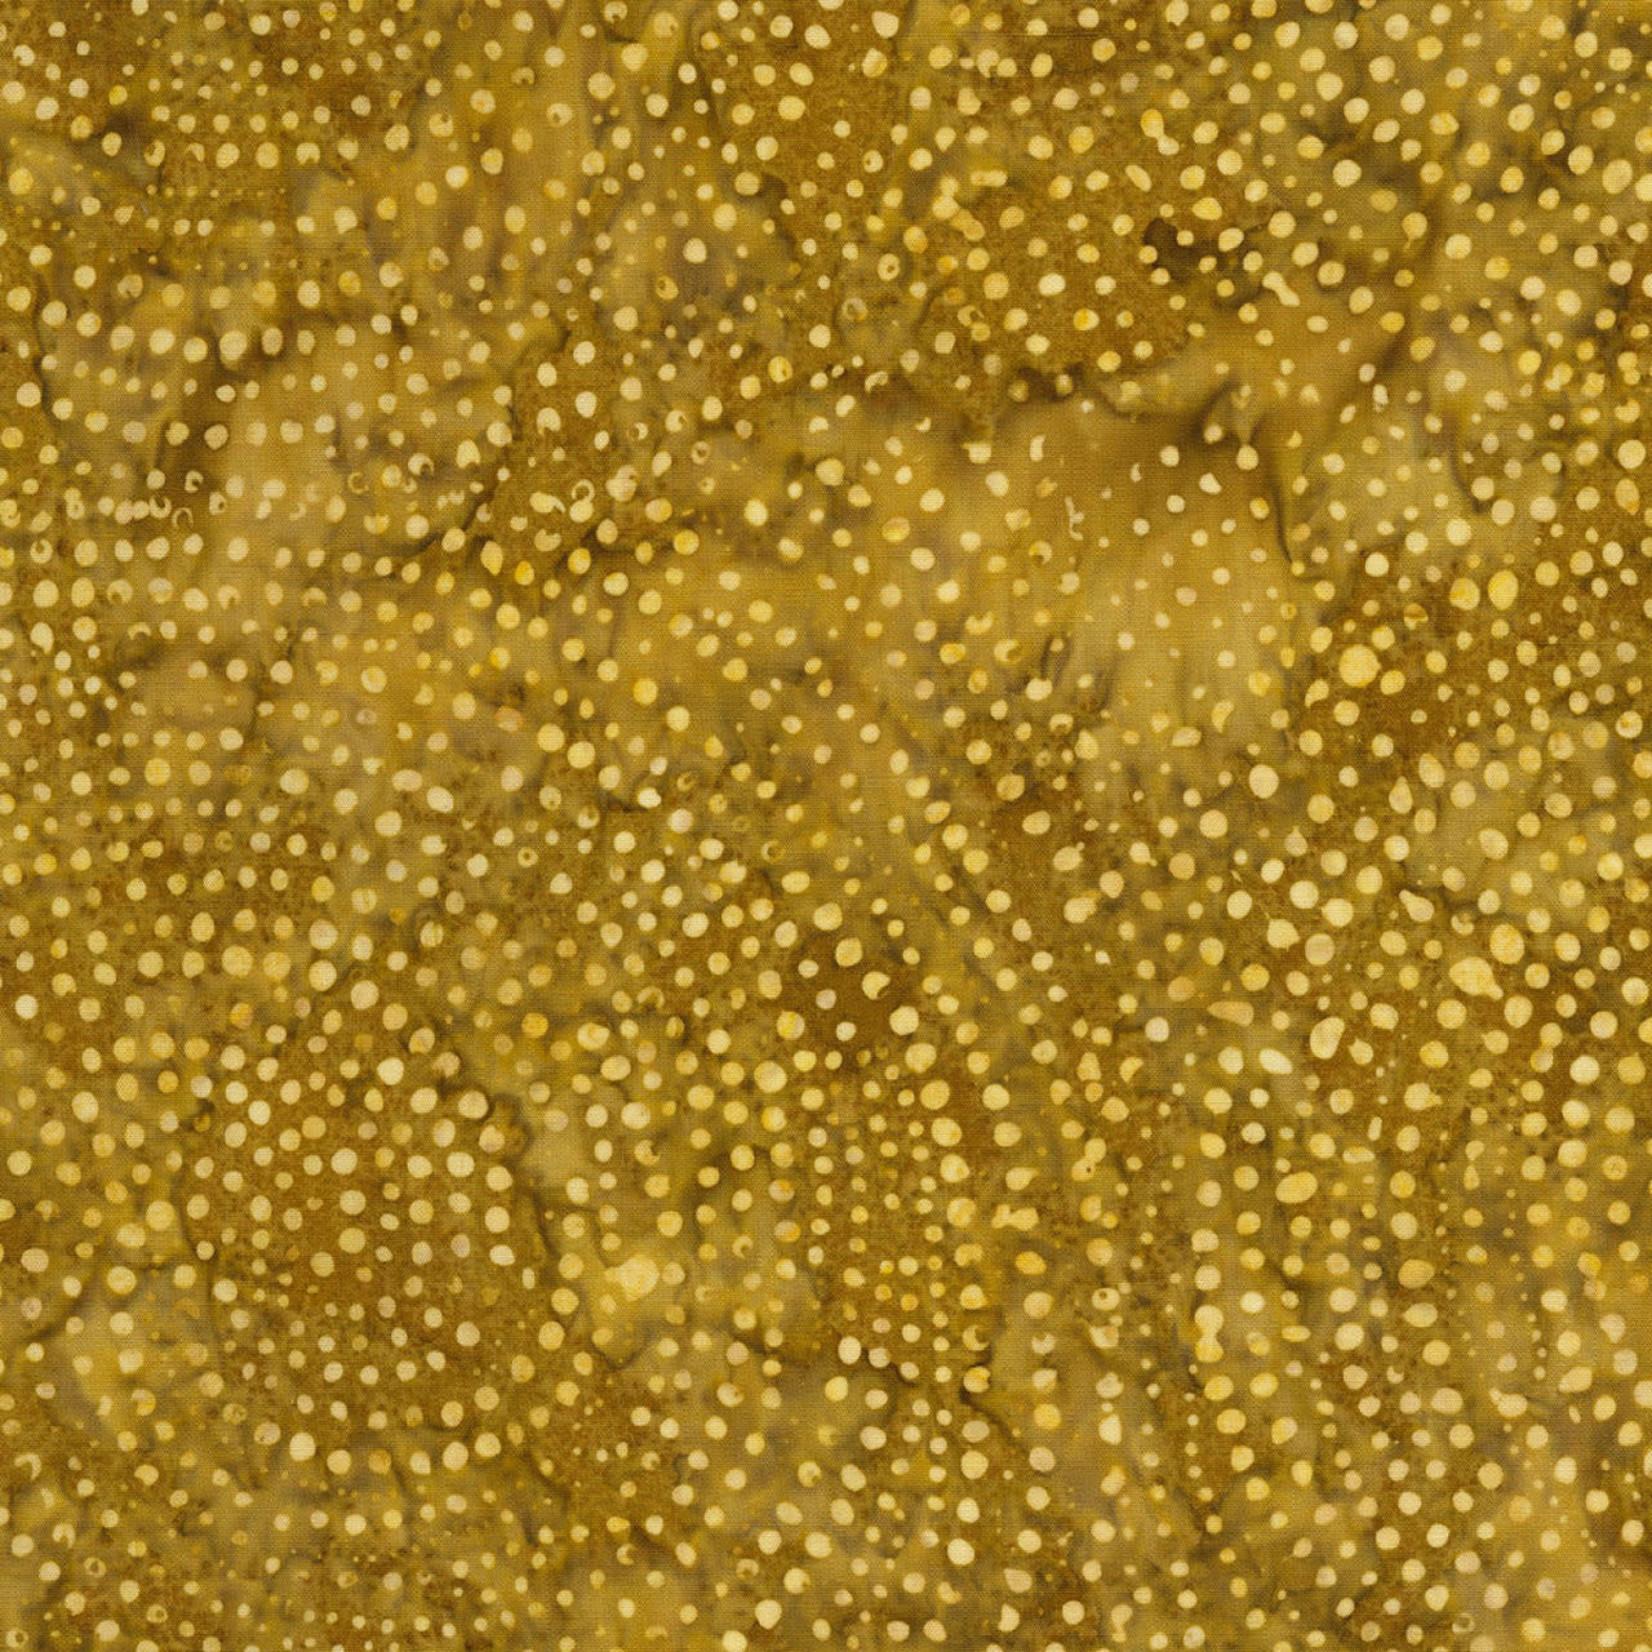 Timeless Treasures Tonga - Dotty Spiral - Gold